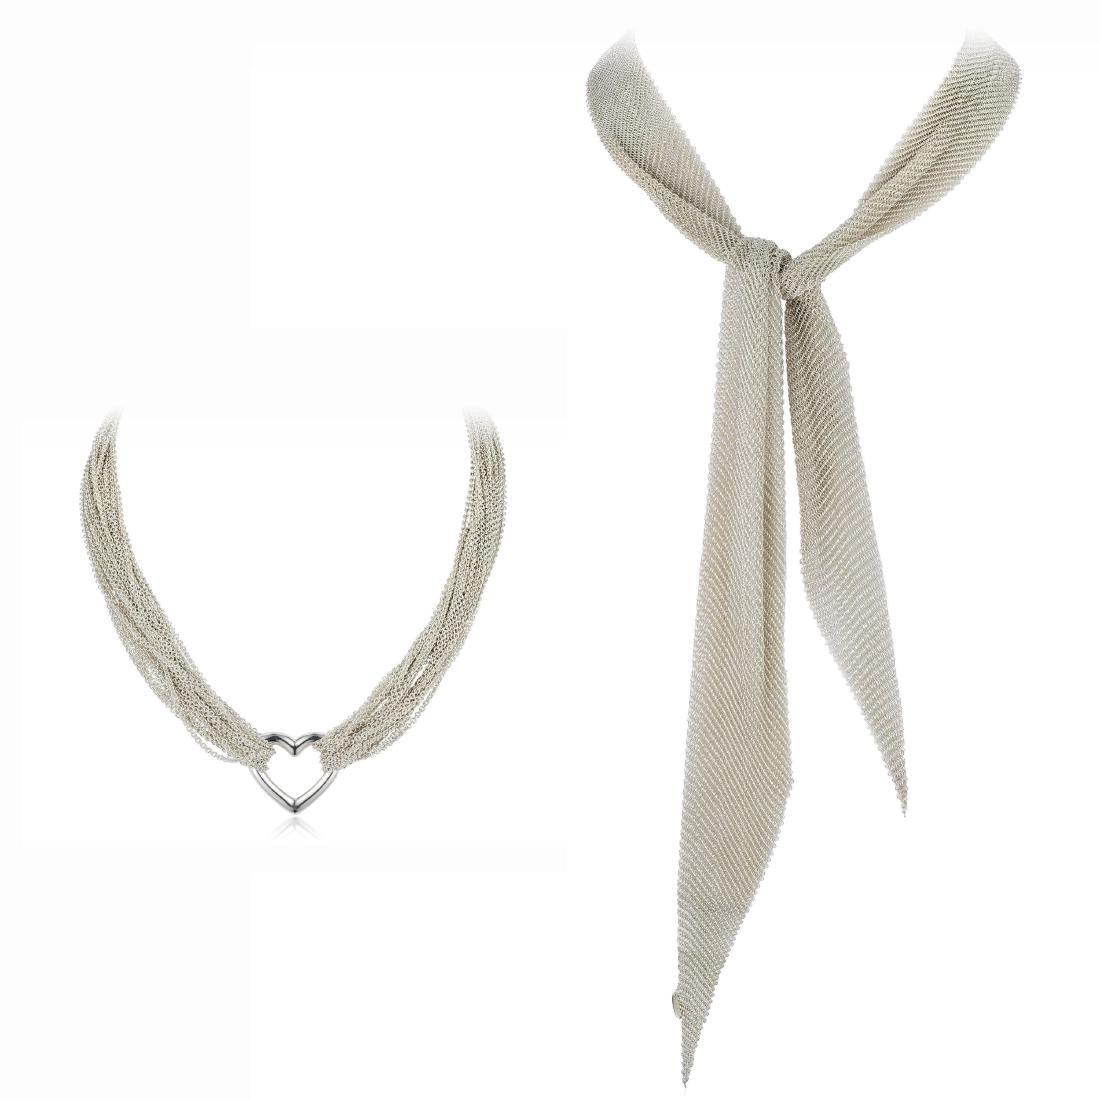 Tiffany & Co. Silver Jewelry